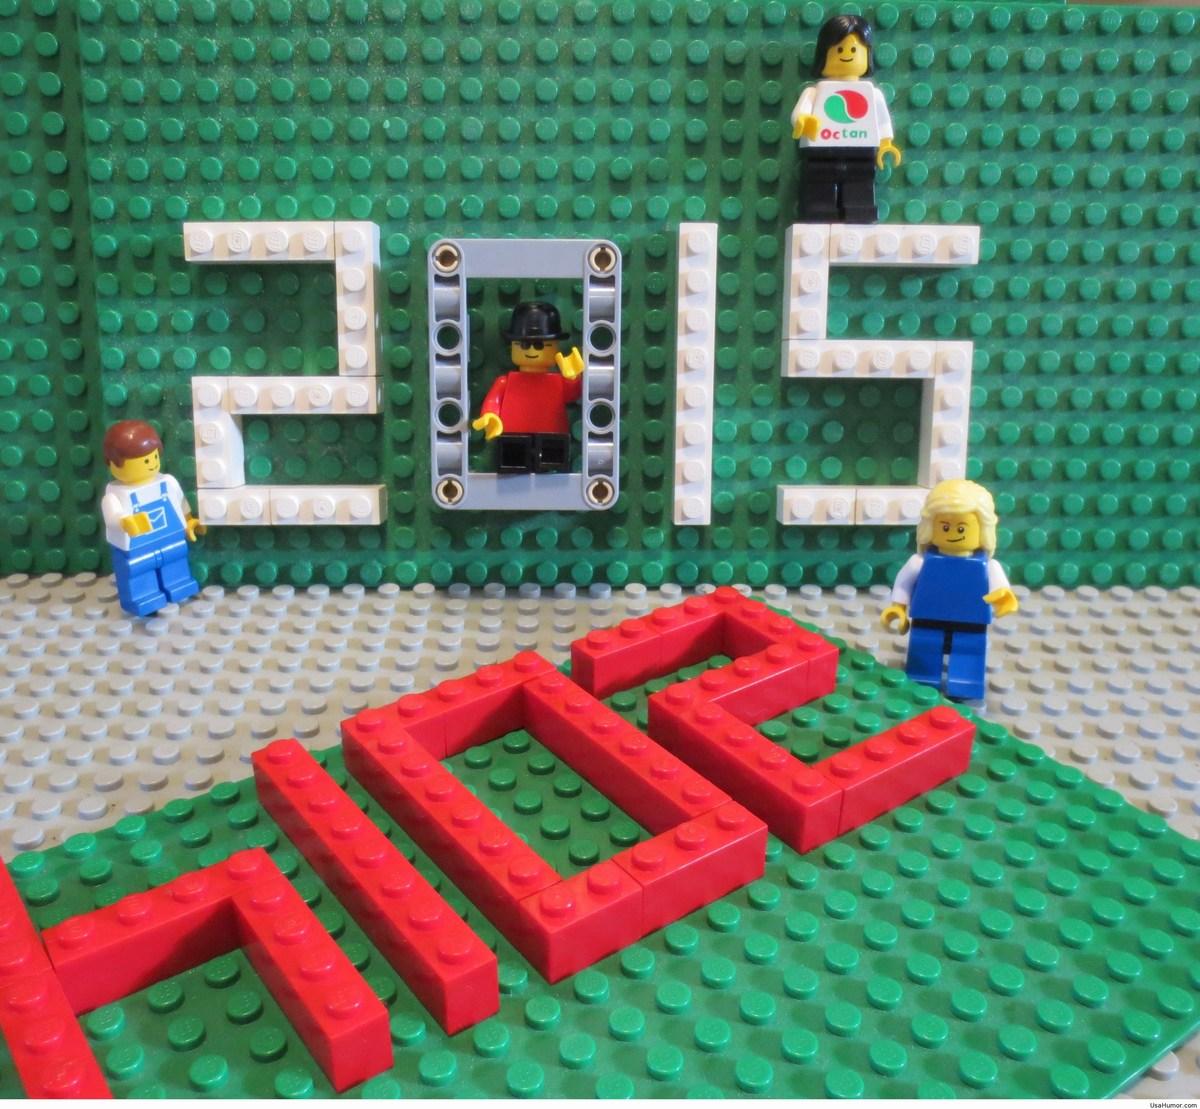 mini-Hello-2015-lego-image